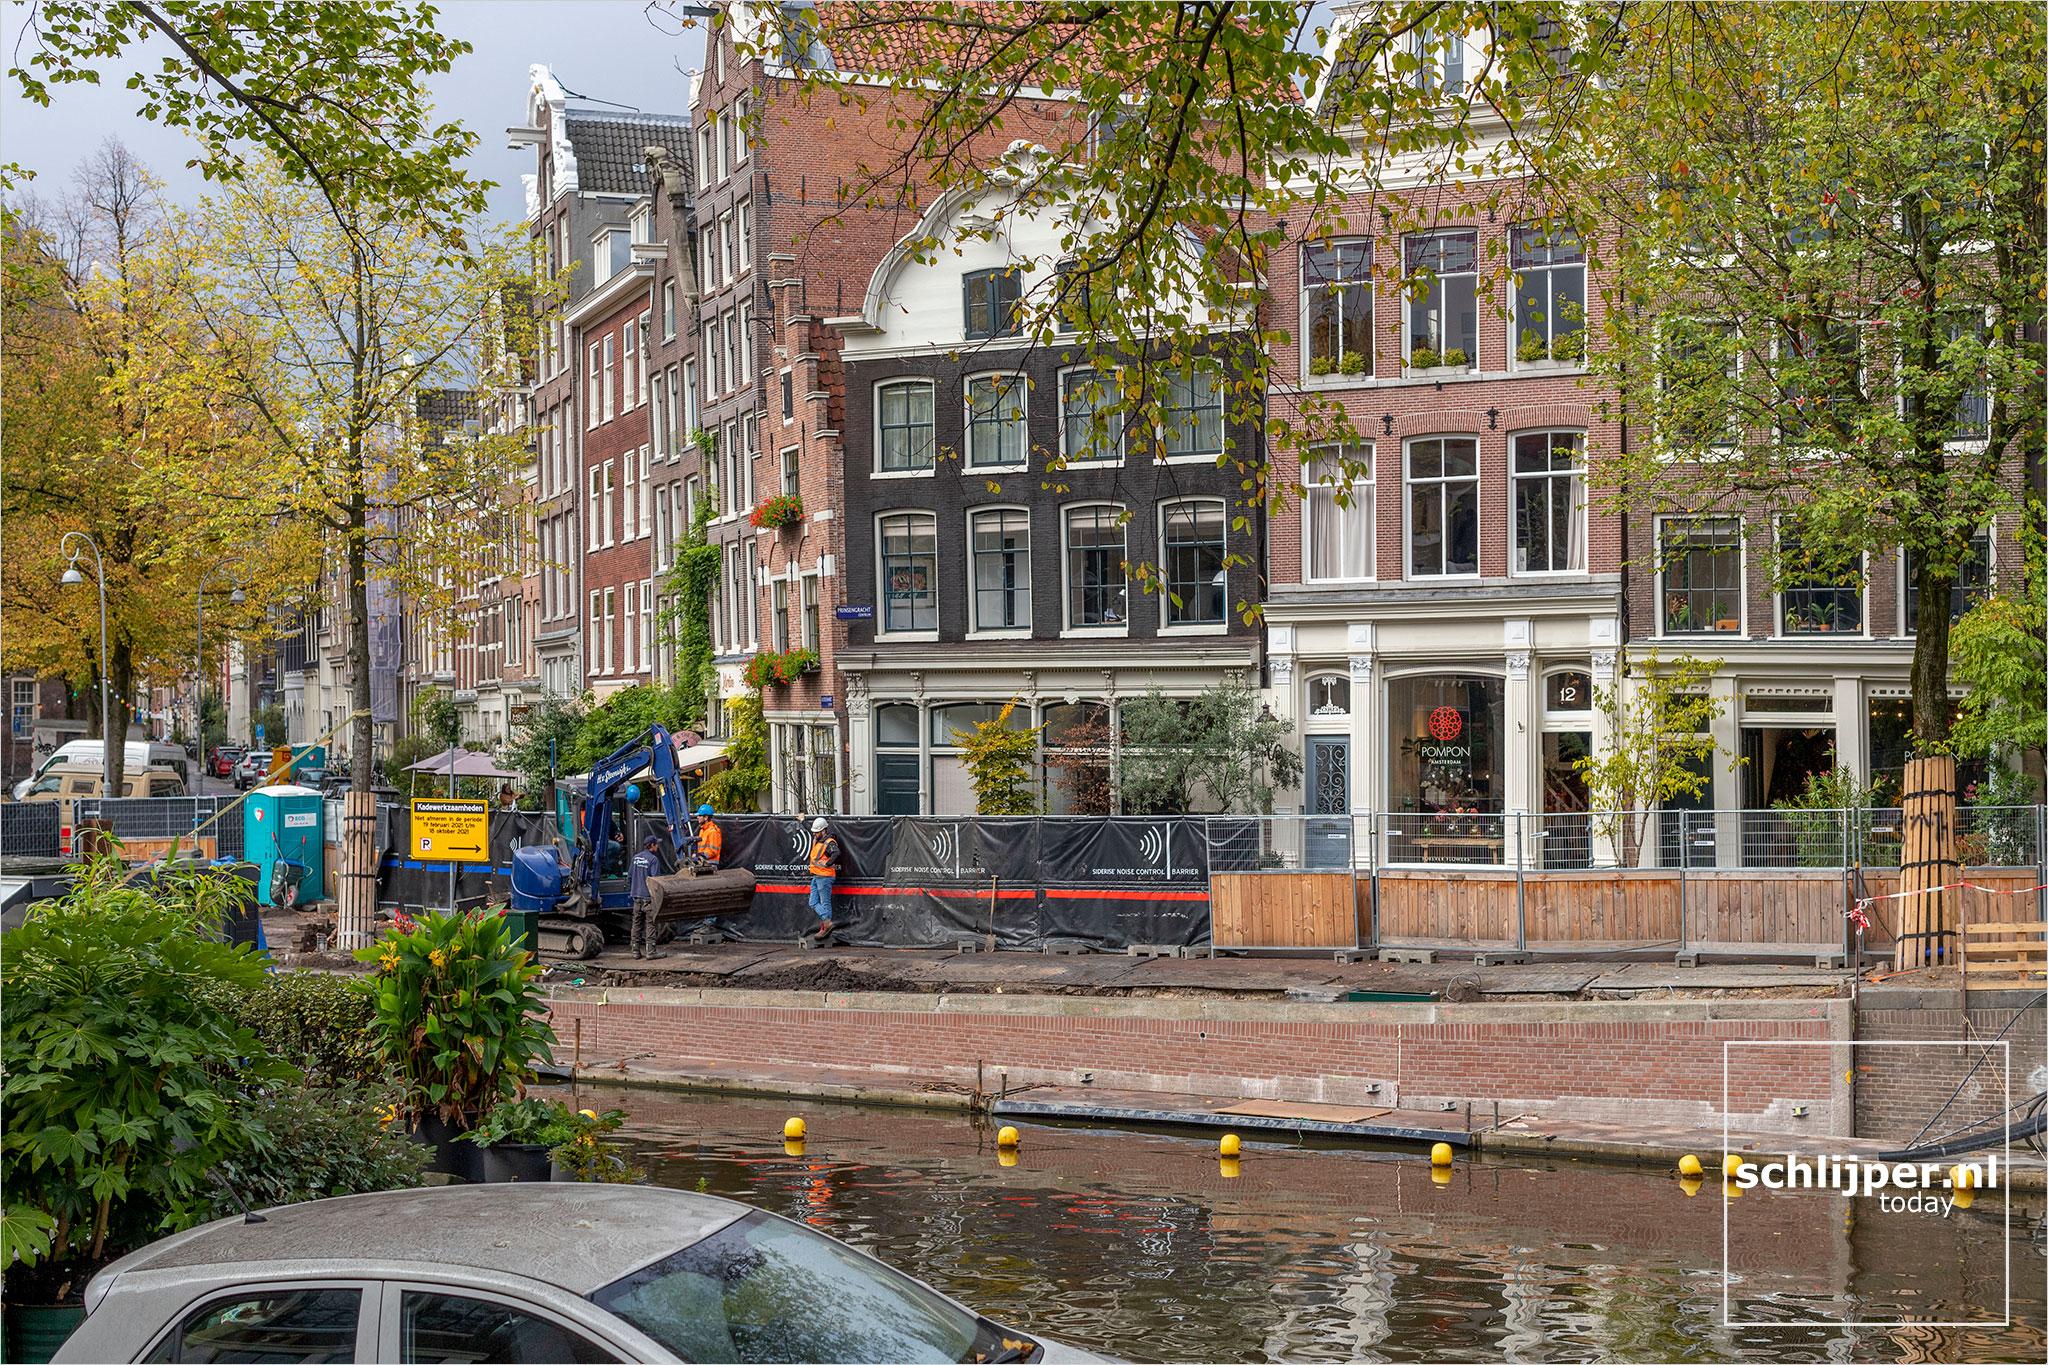 The Netherlands, Amsterdam, 13 oktober 2021